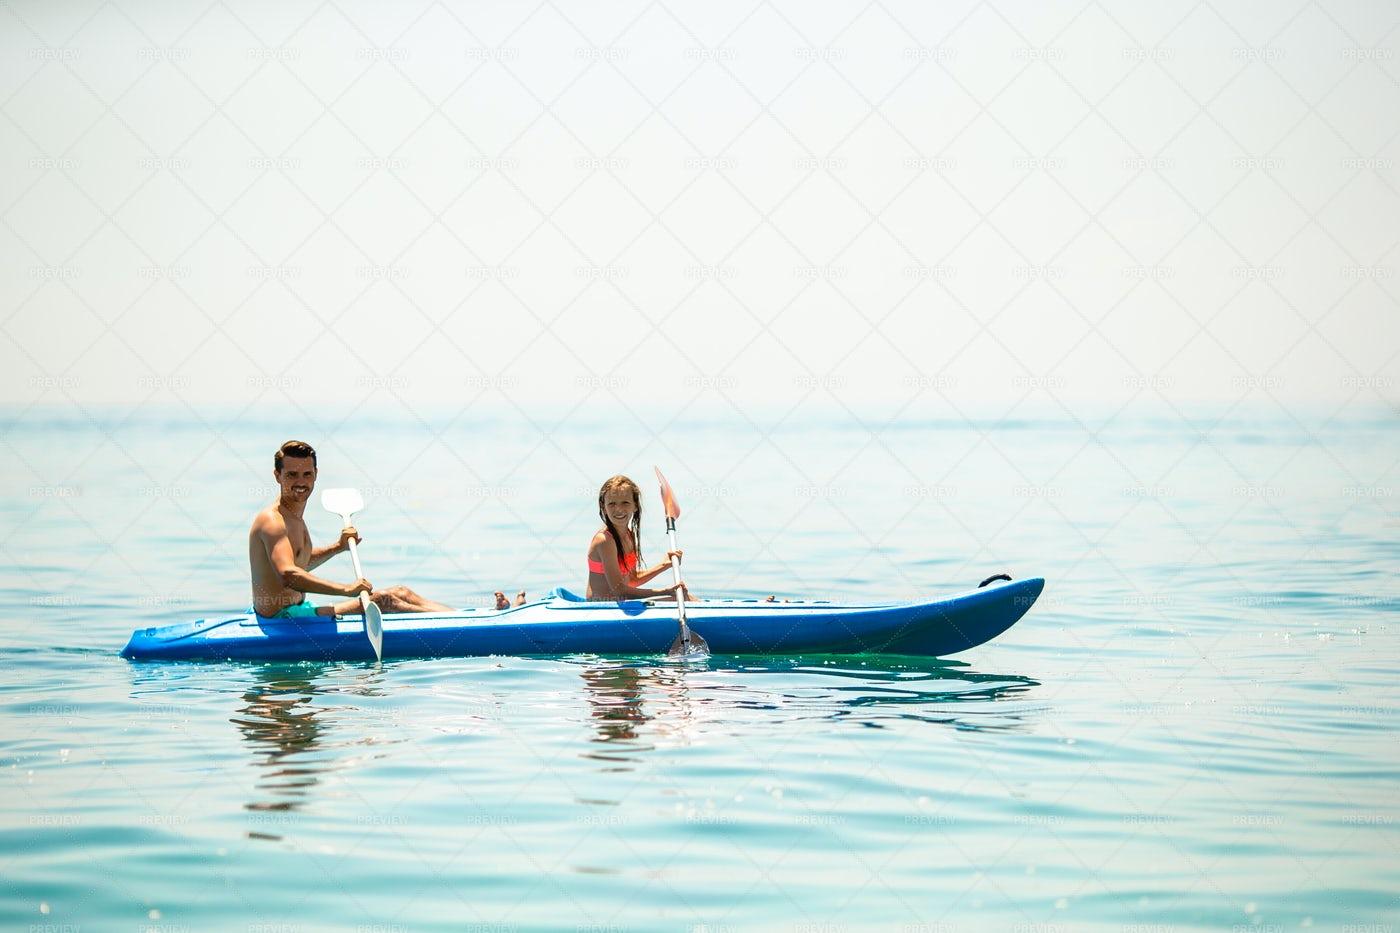 Family Kayaking: Stock Photos